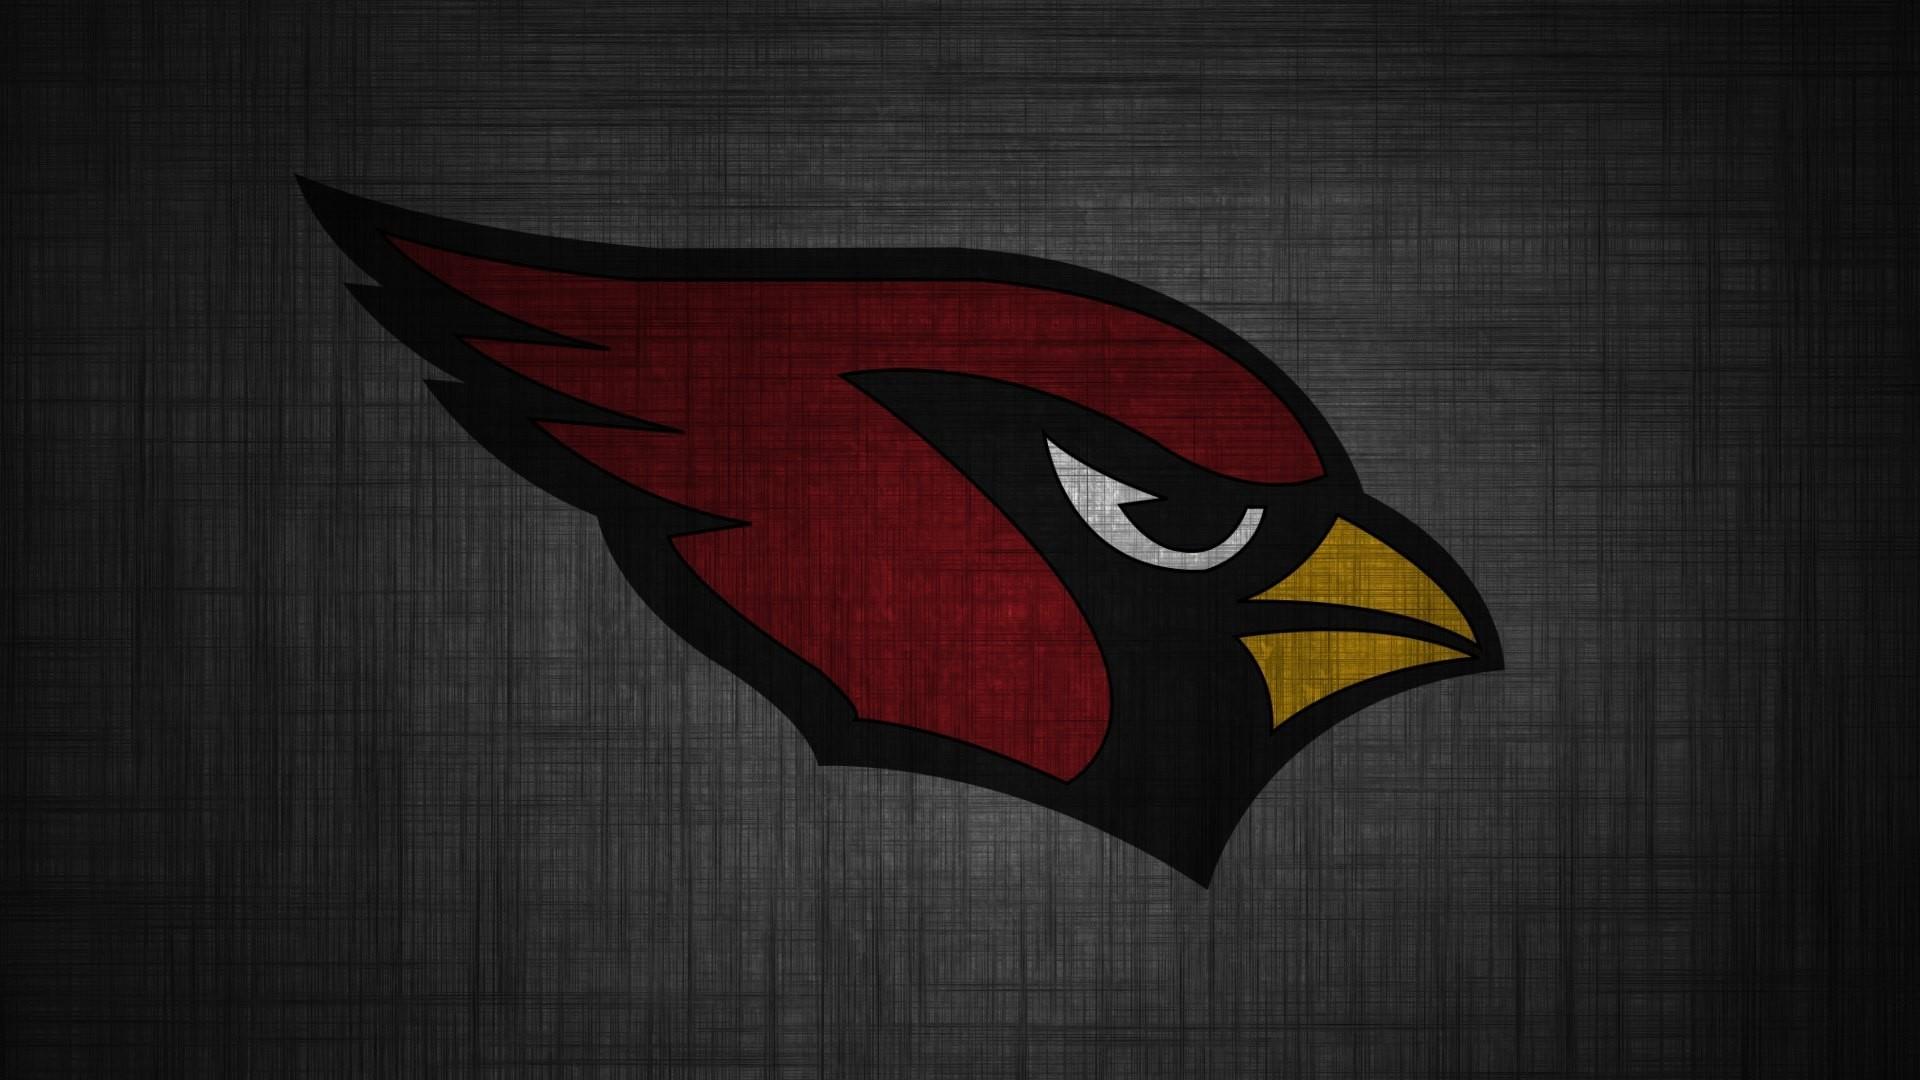 11 Hd Arizona Cardinals Wallpapers Hdwallsource Com